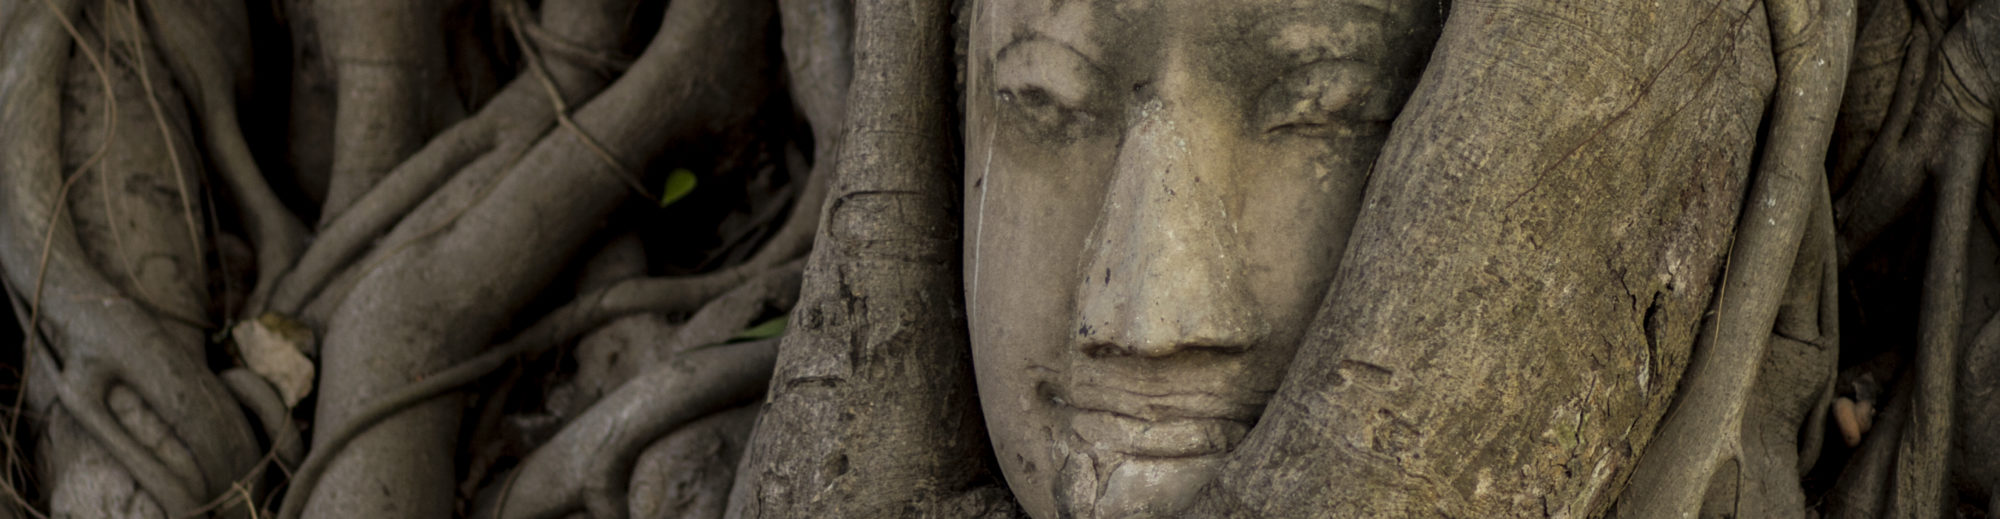 Compassionate Balance Meditation